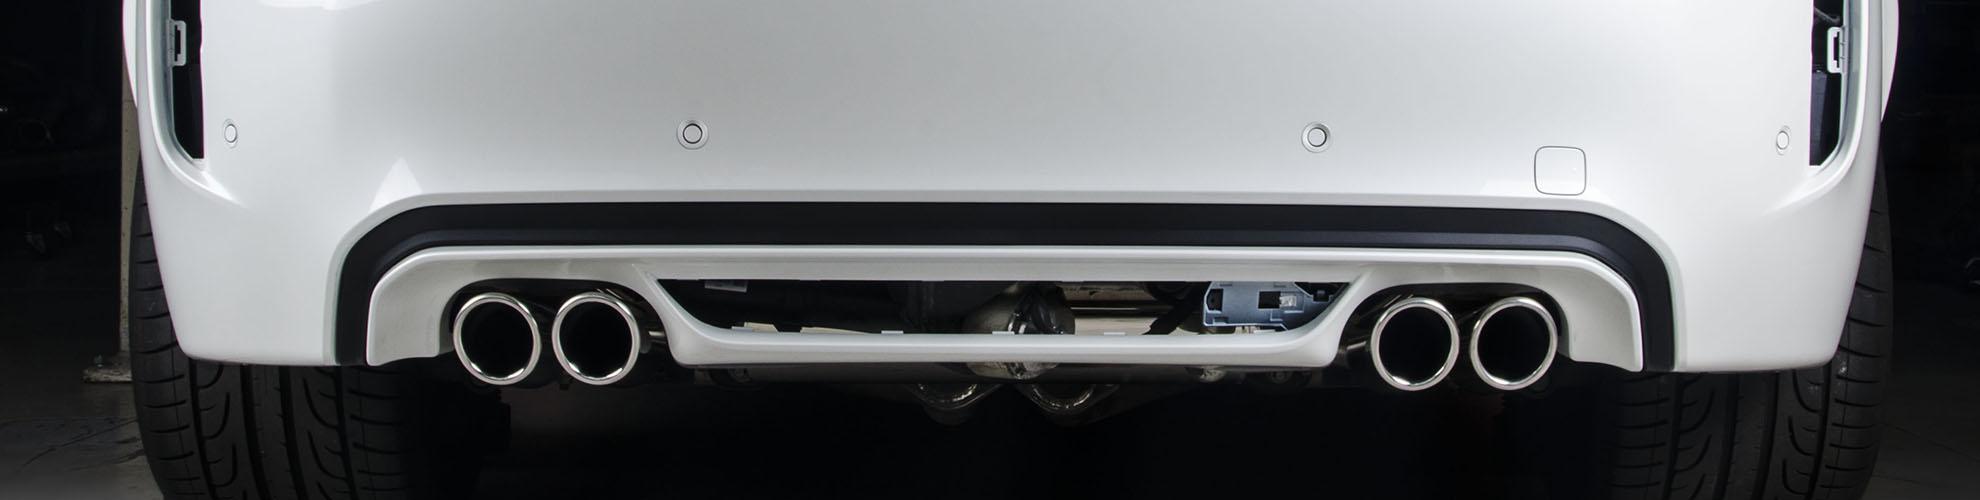 BMW X6 M50d (2015)